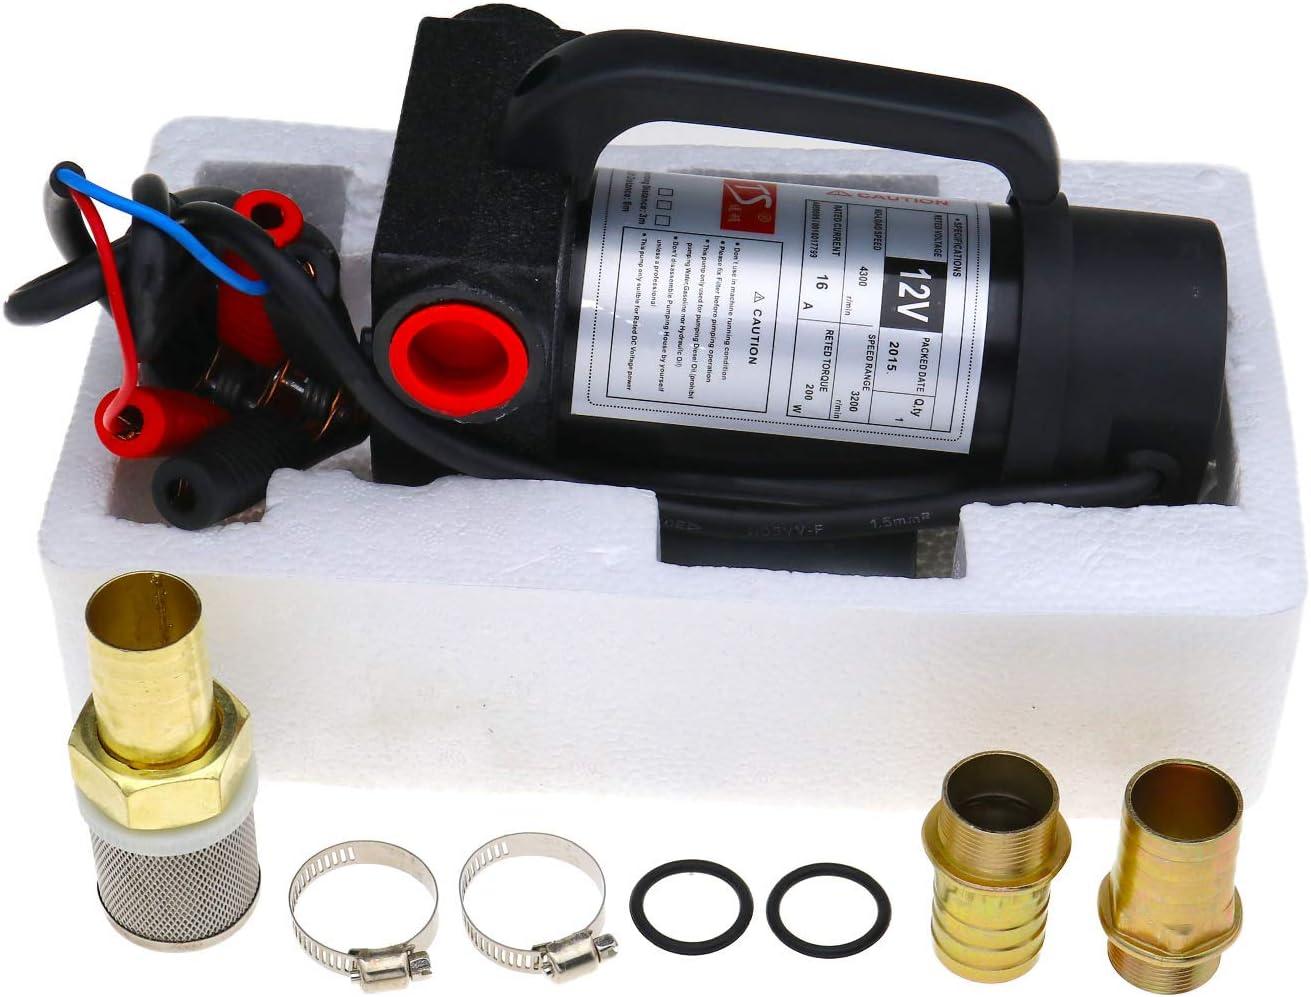 ENET Juego de 200 W 42 L/min extractor de fluidos diésel de transferencia eléctrica DC 12 V bomba de combustible de alta velocidad Kit de bomba de combustible